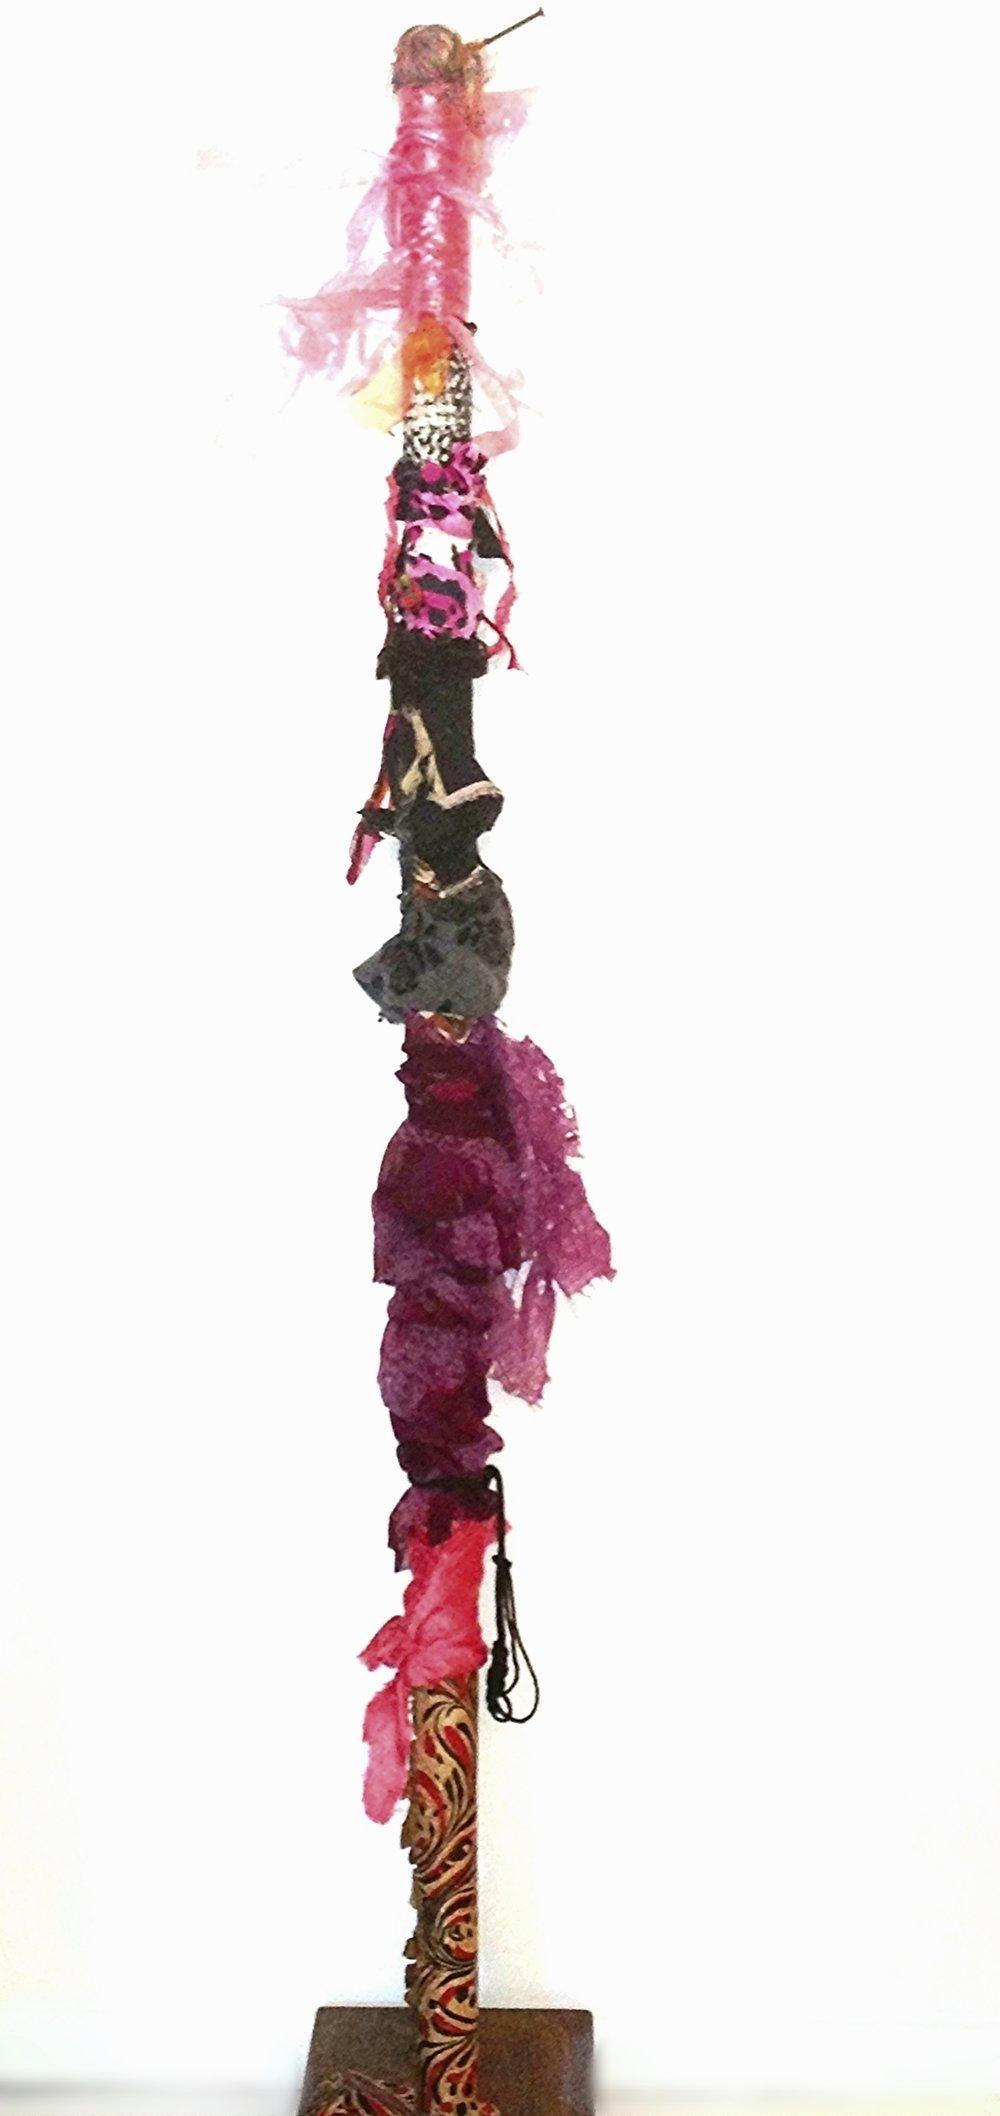 Wedding  Pole. Textile,Japanese cellophane, rust, vintage thread spool, acrylic, paper, yarn, cord, on industrial cardboard tube.57 x 12 in. round (144.78 x 30.48 cm.)2016.